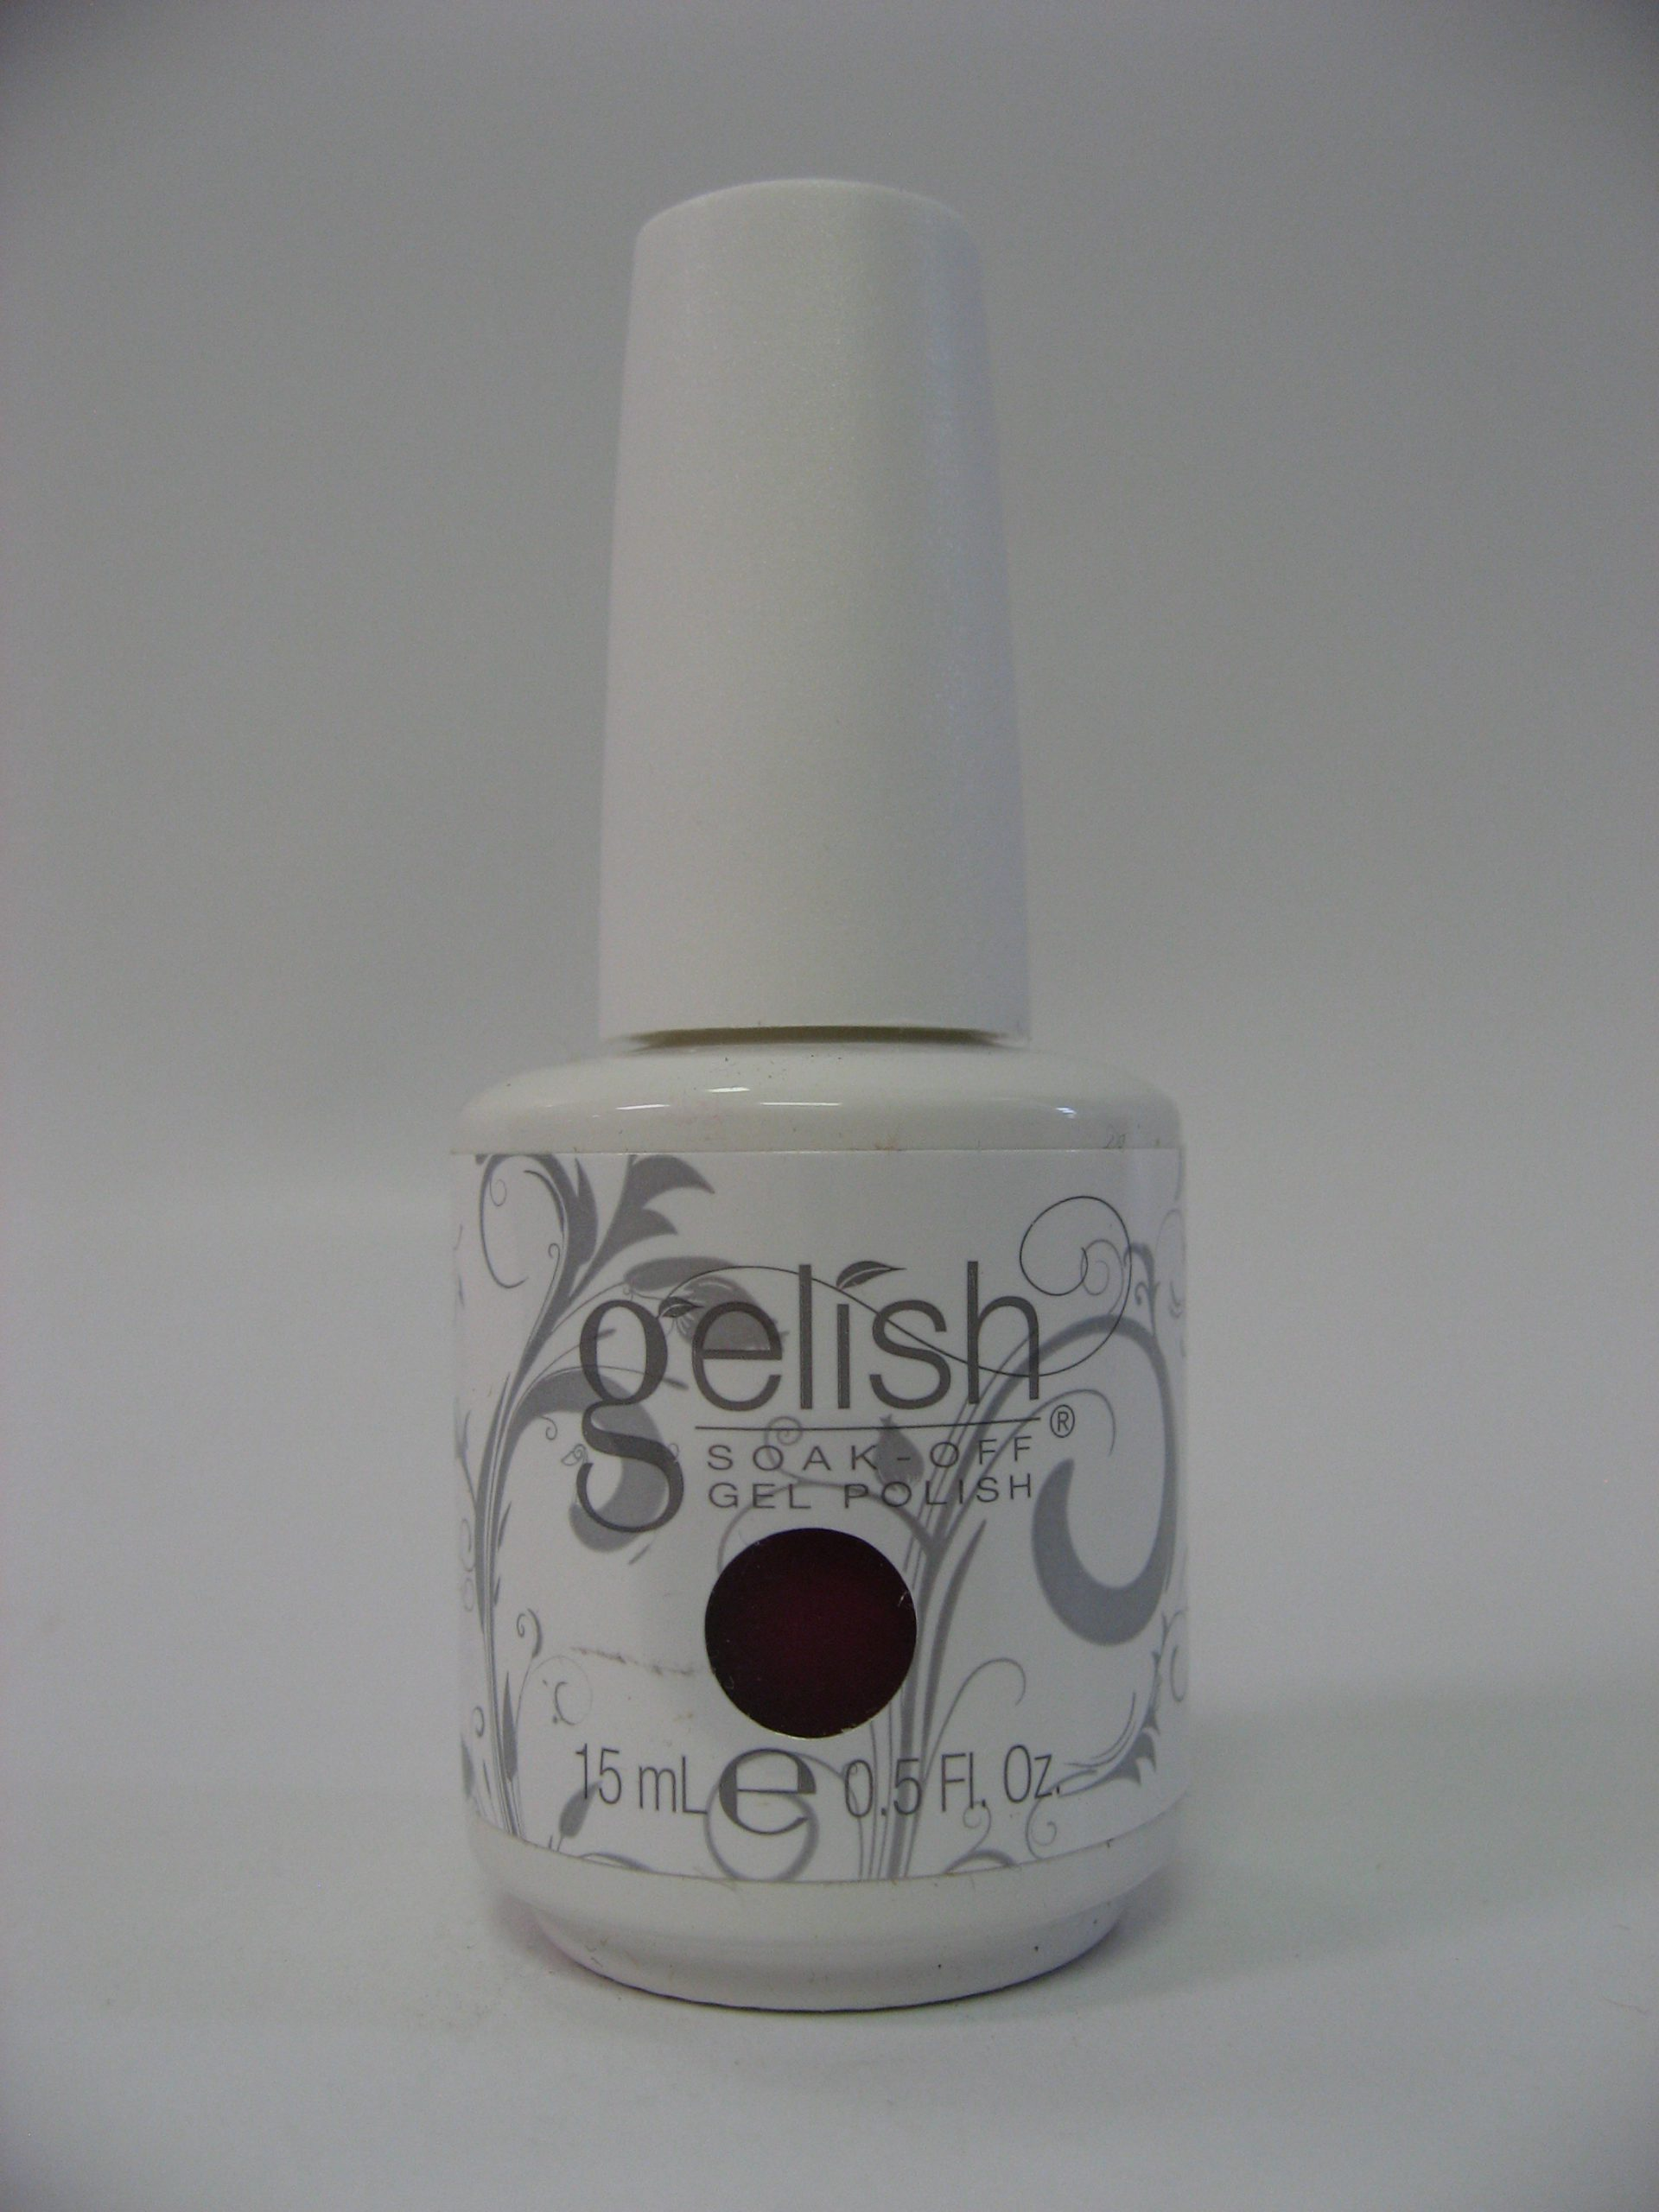 Gelish Soak Off Gel Polish - 1336 - Rendezvous